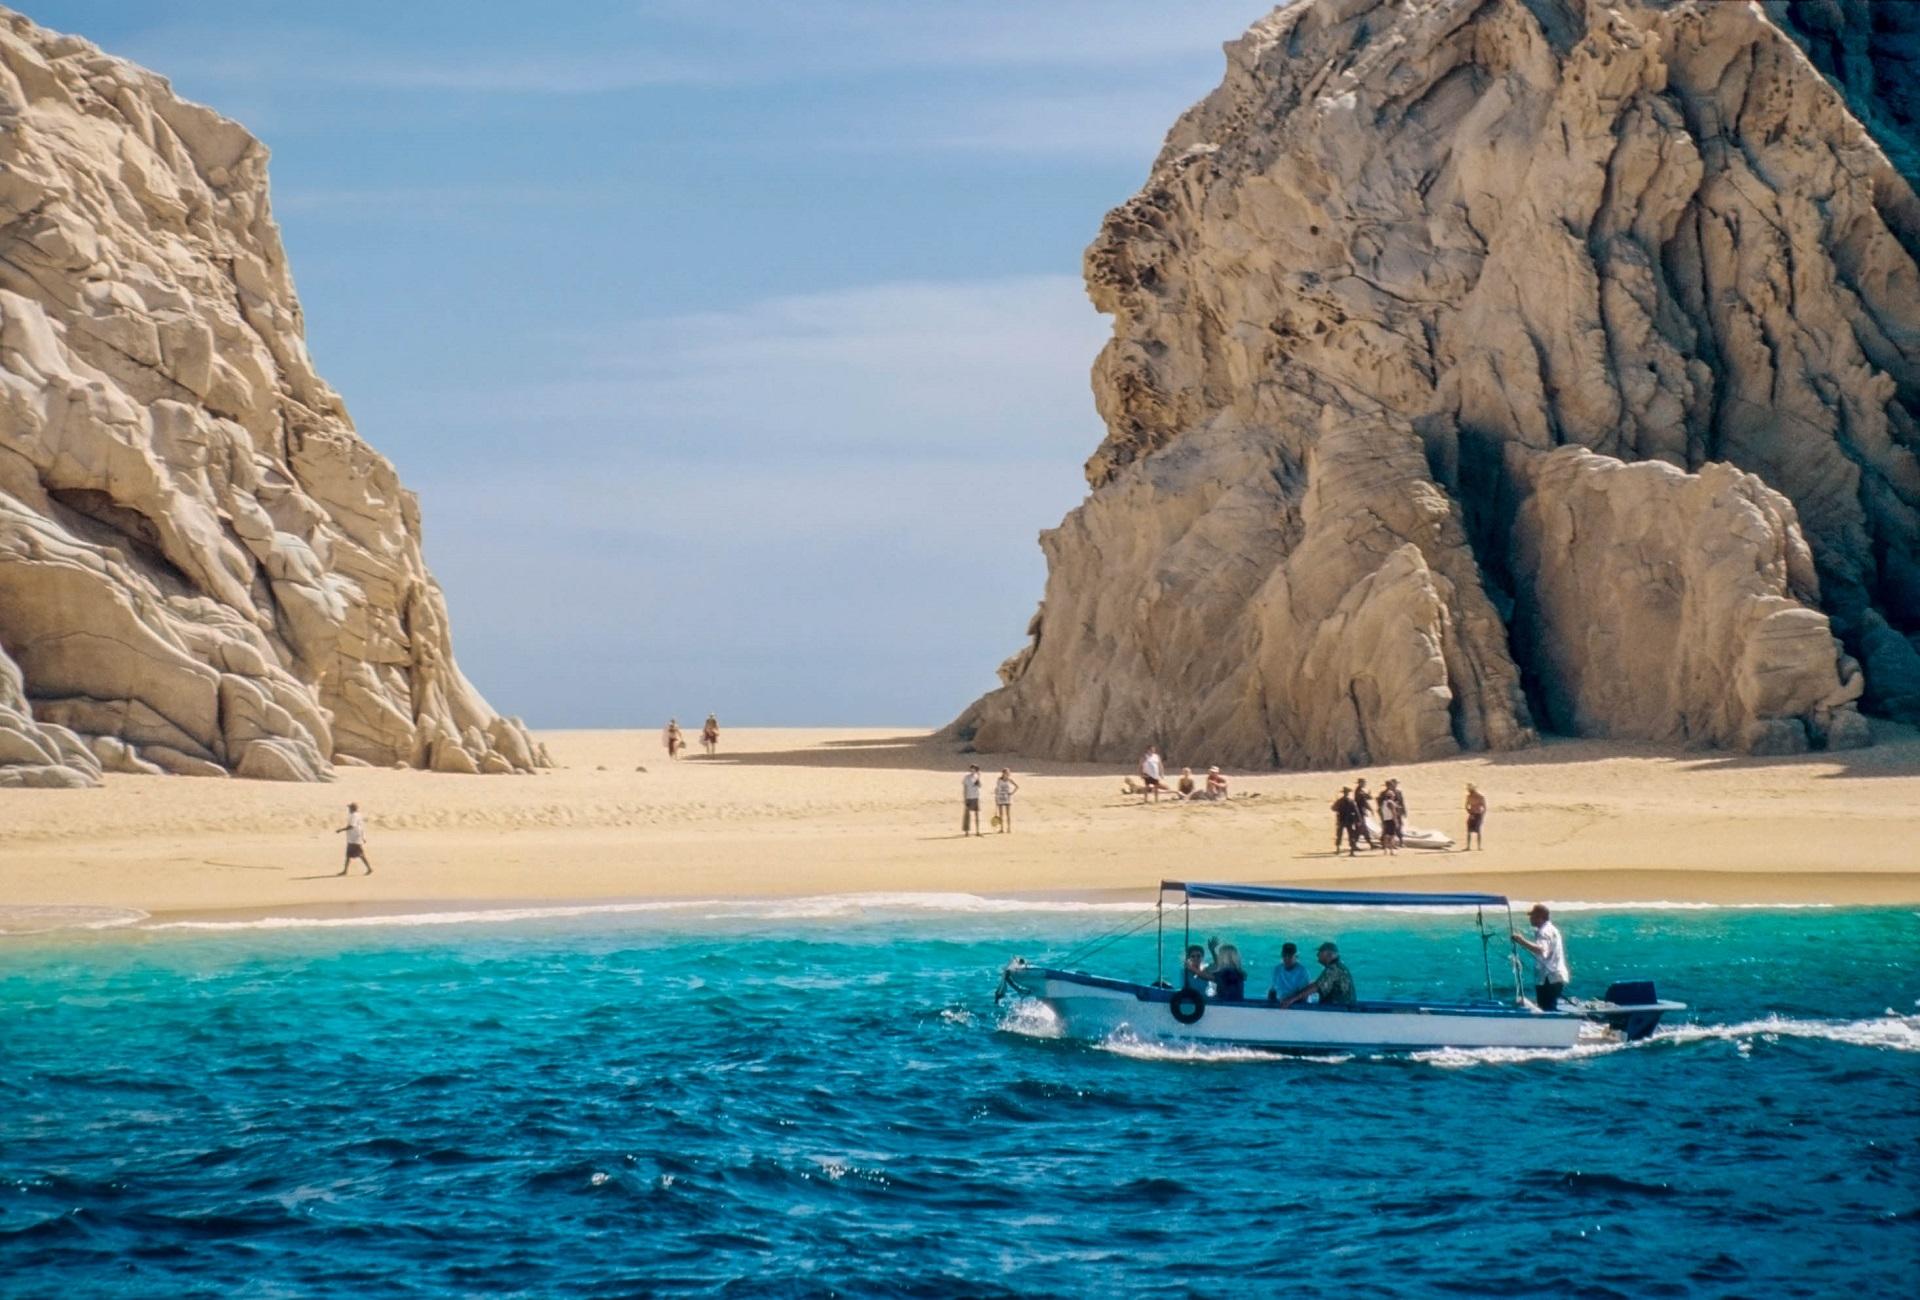 Die 10 Besten Hotels nahe Medano Beach, Cabo San Lucas